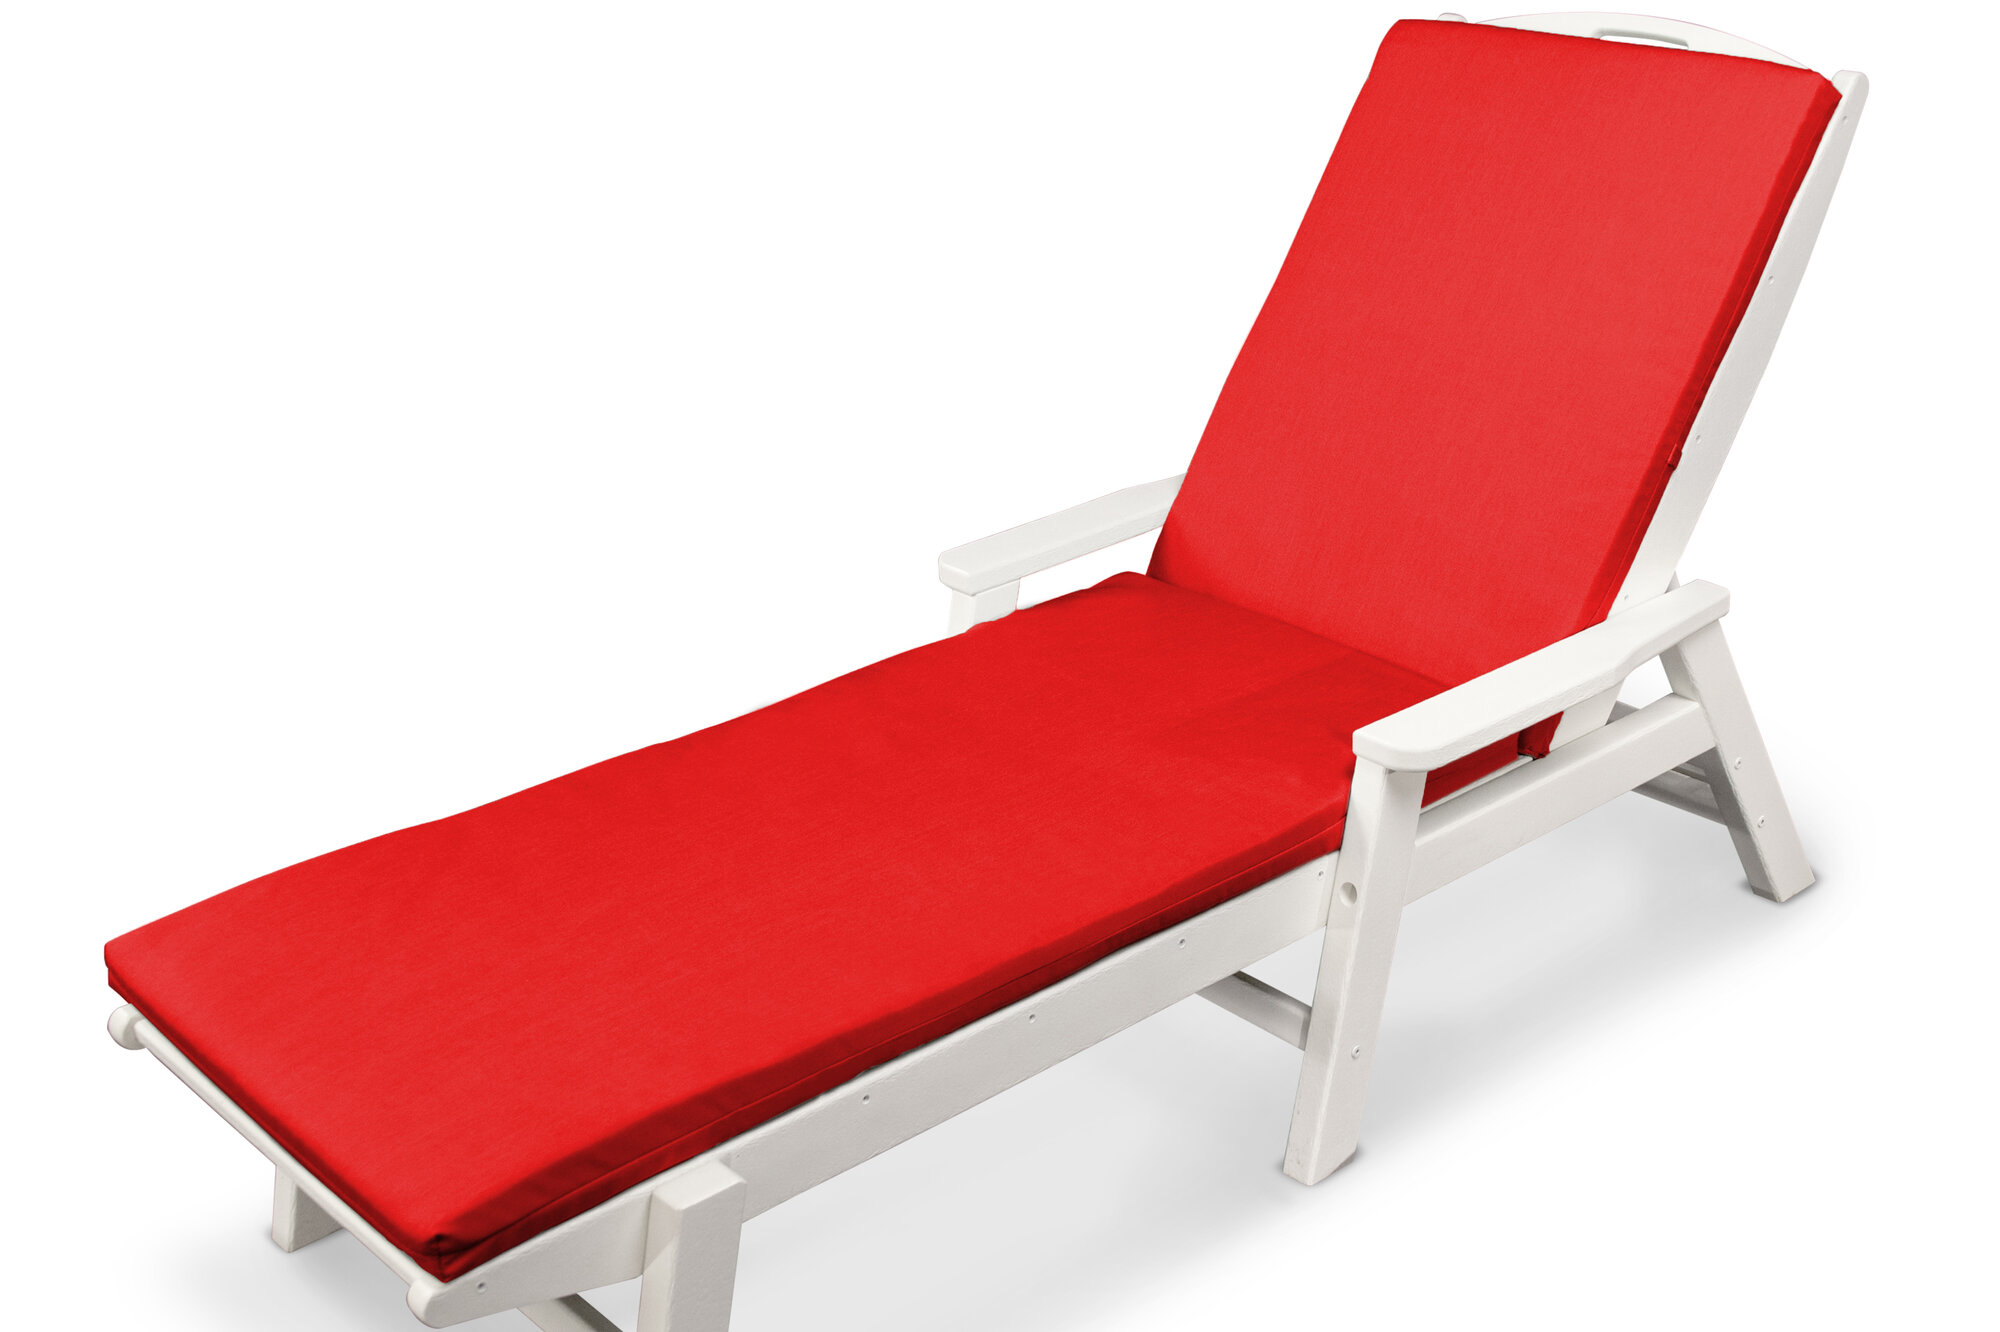 Ateeva outdoor sunbrella chaise lounge cushion ebay for Chaise loung cushions